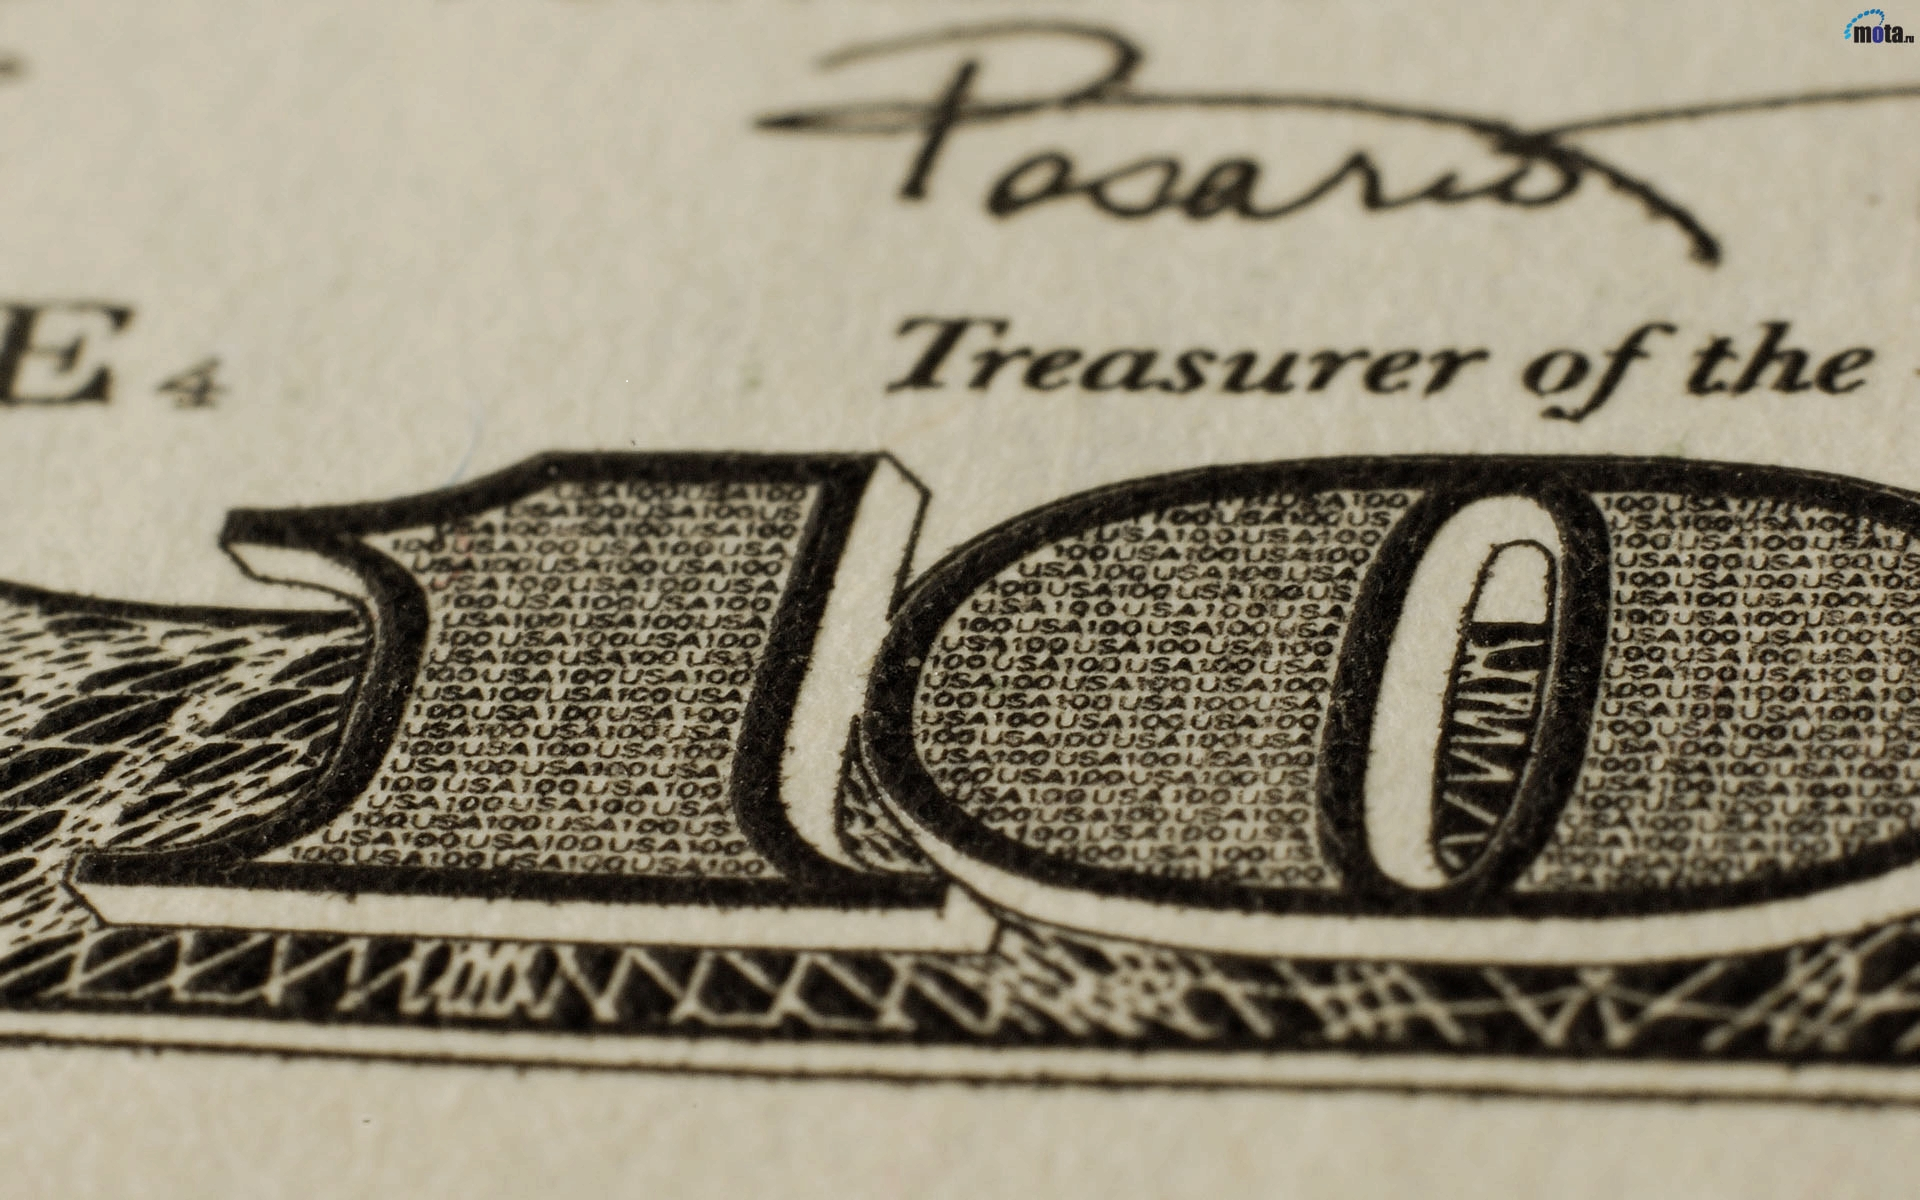 dollarbill-jpeg-1920×-wallpaper-wpc920441